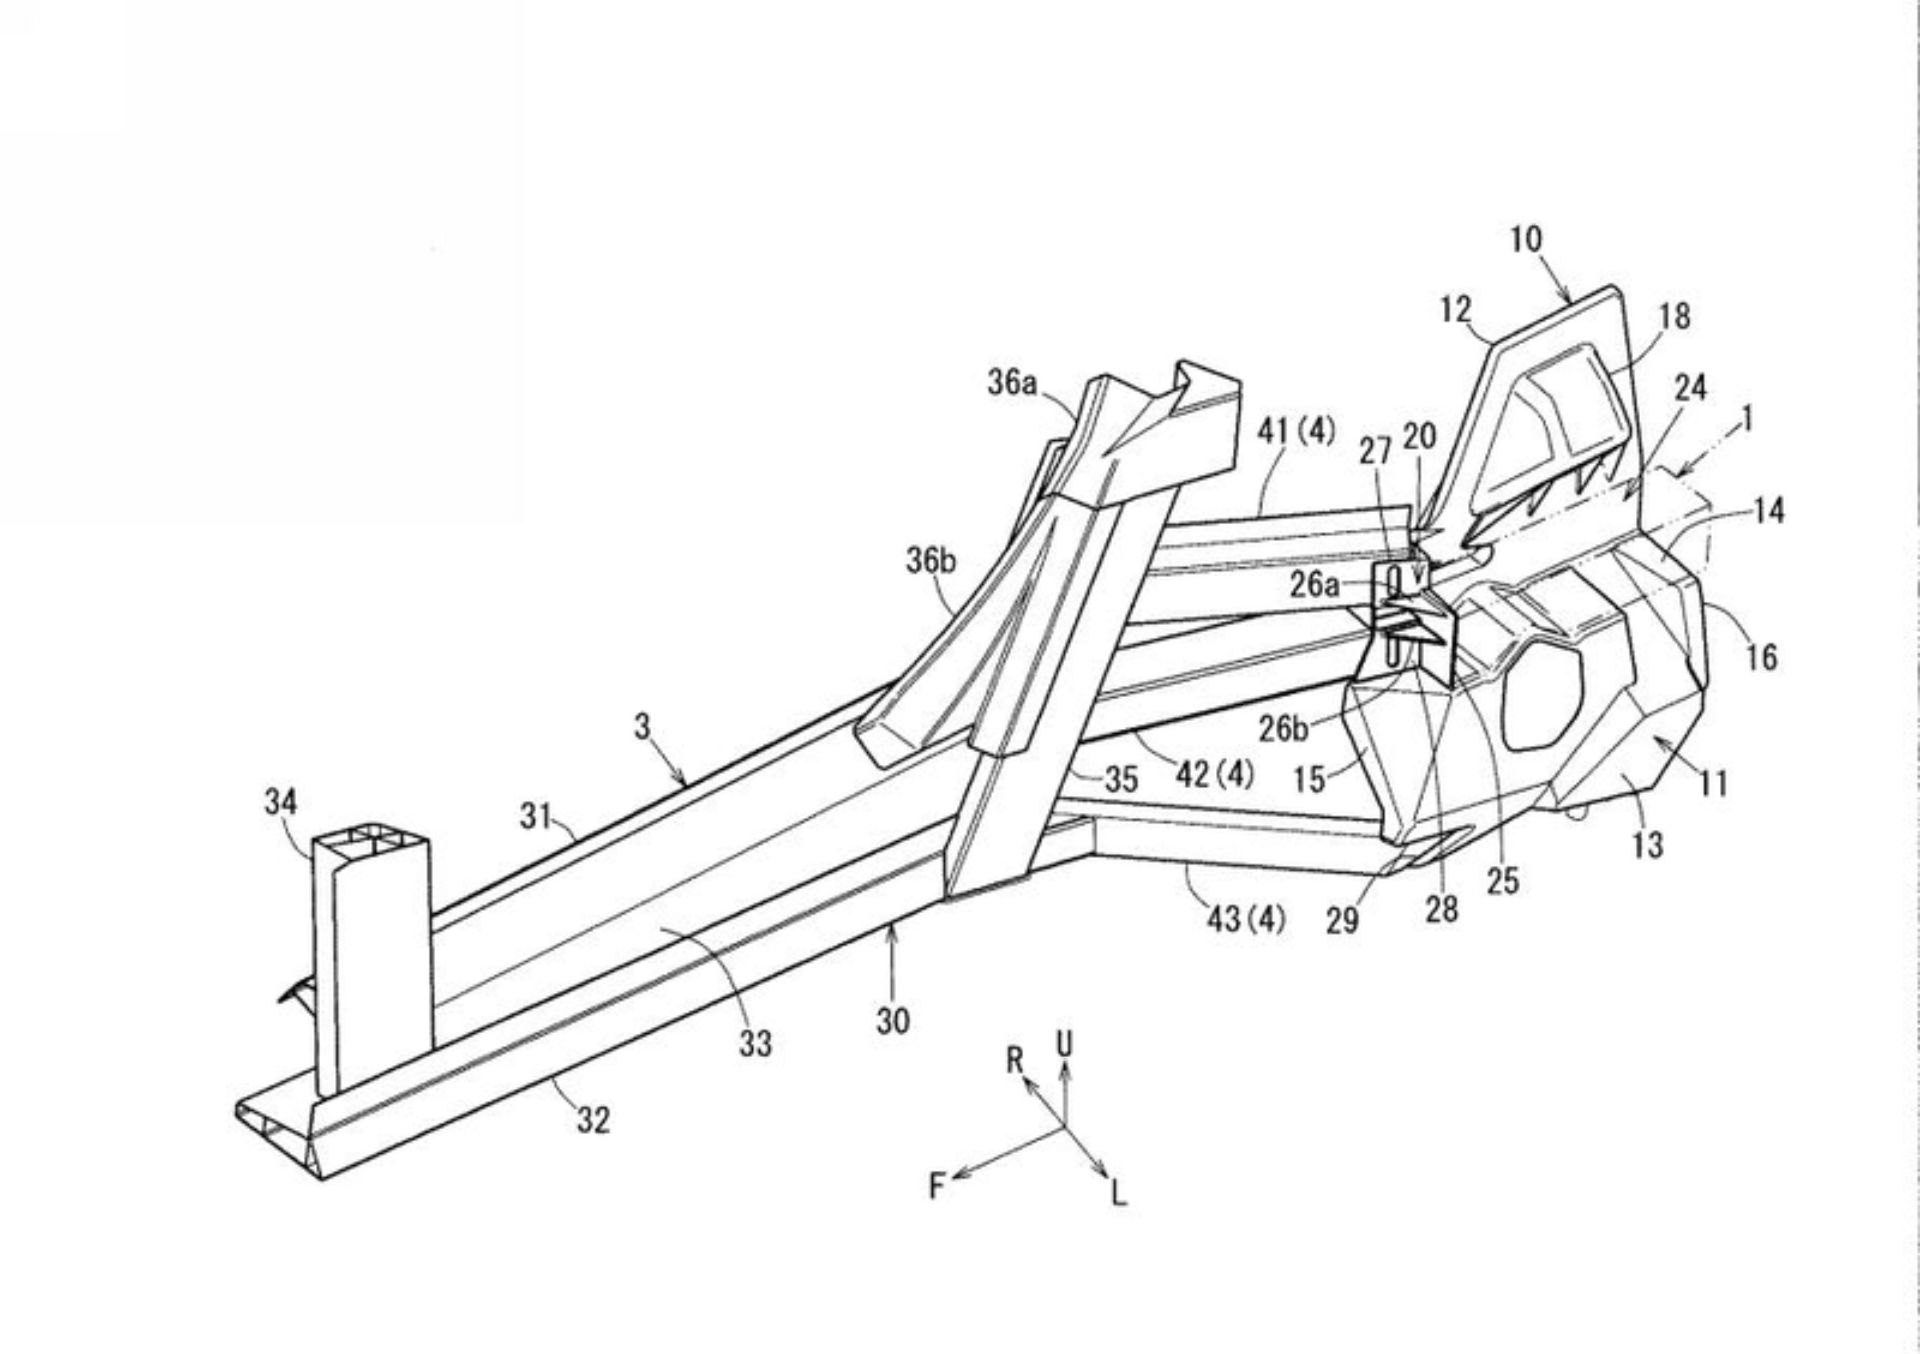 Mazda-Structure-patent-filing-4